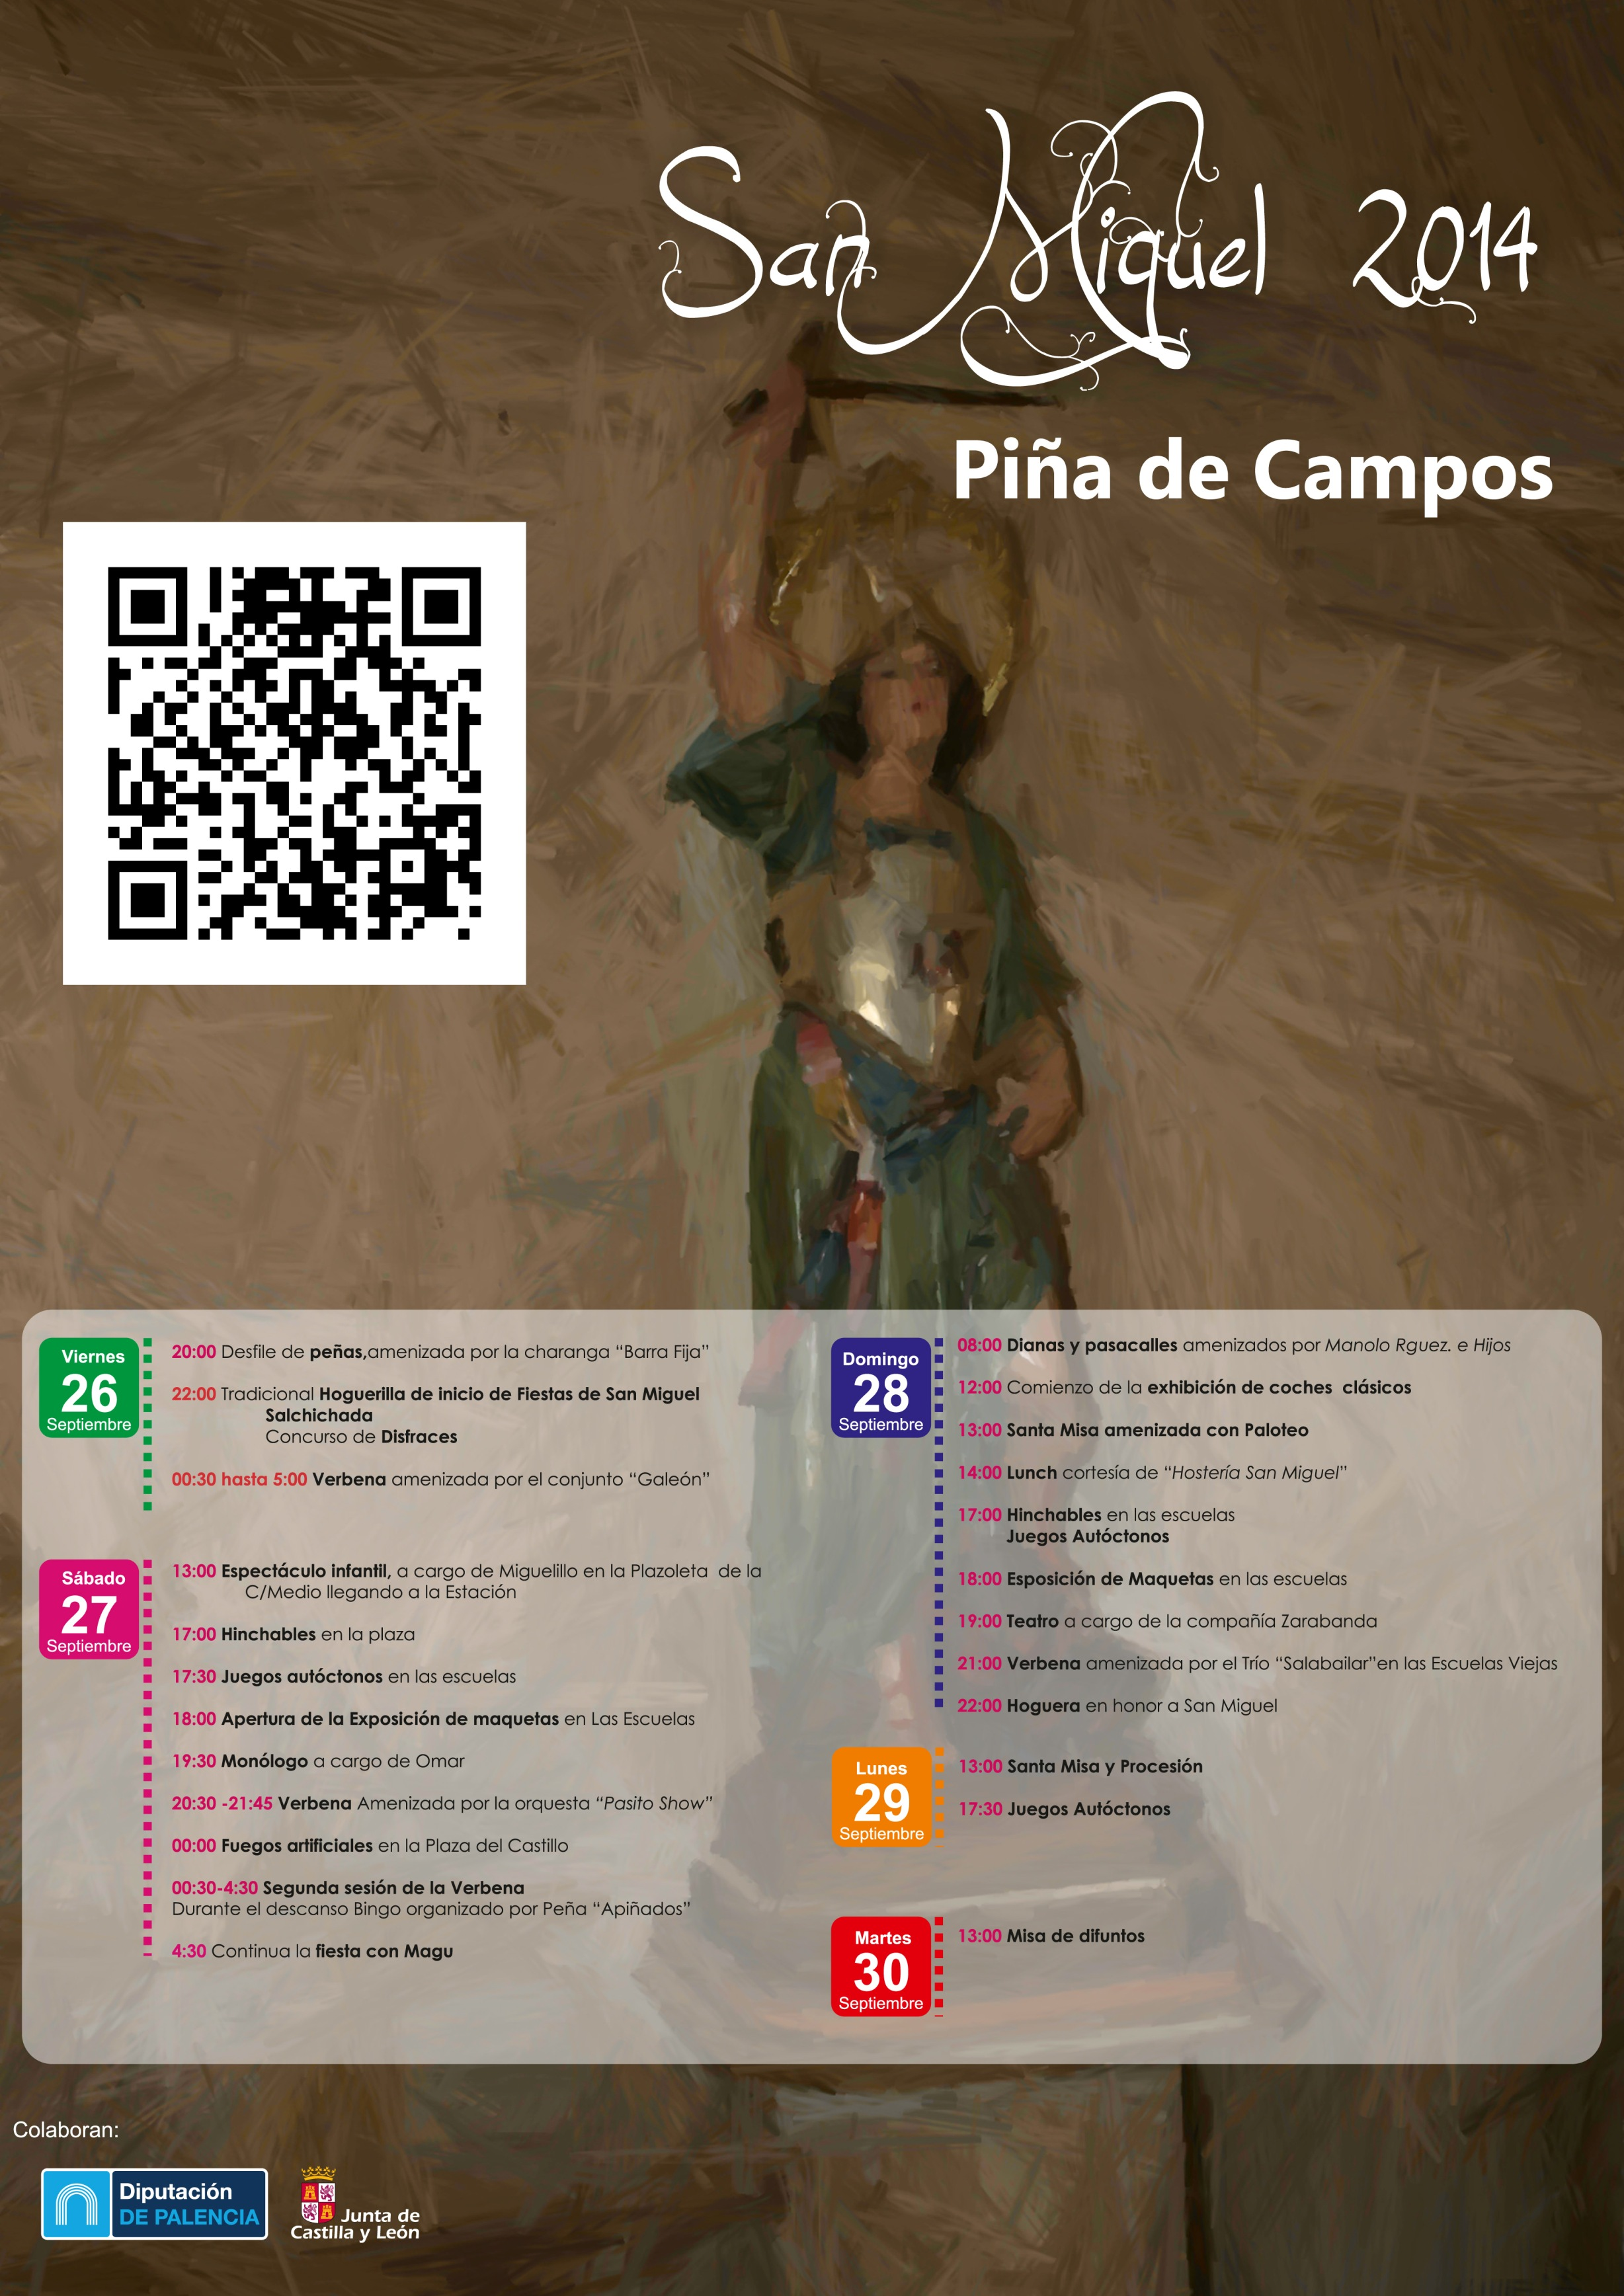 Fiestas San Miguel 2014